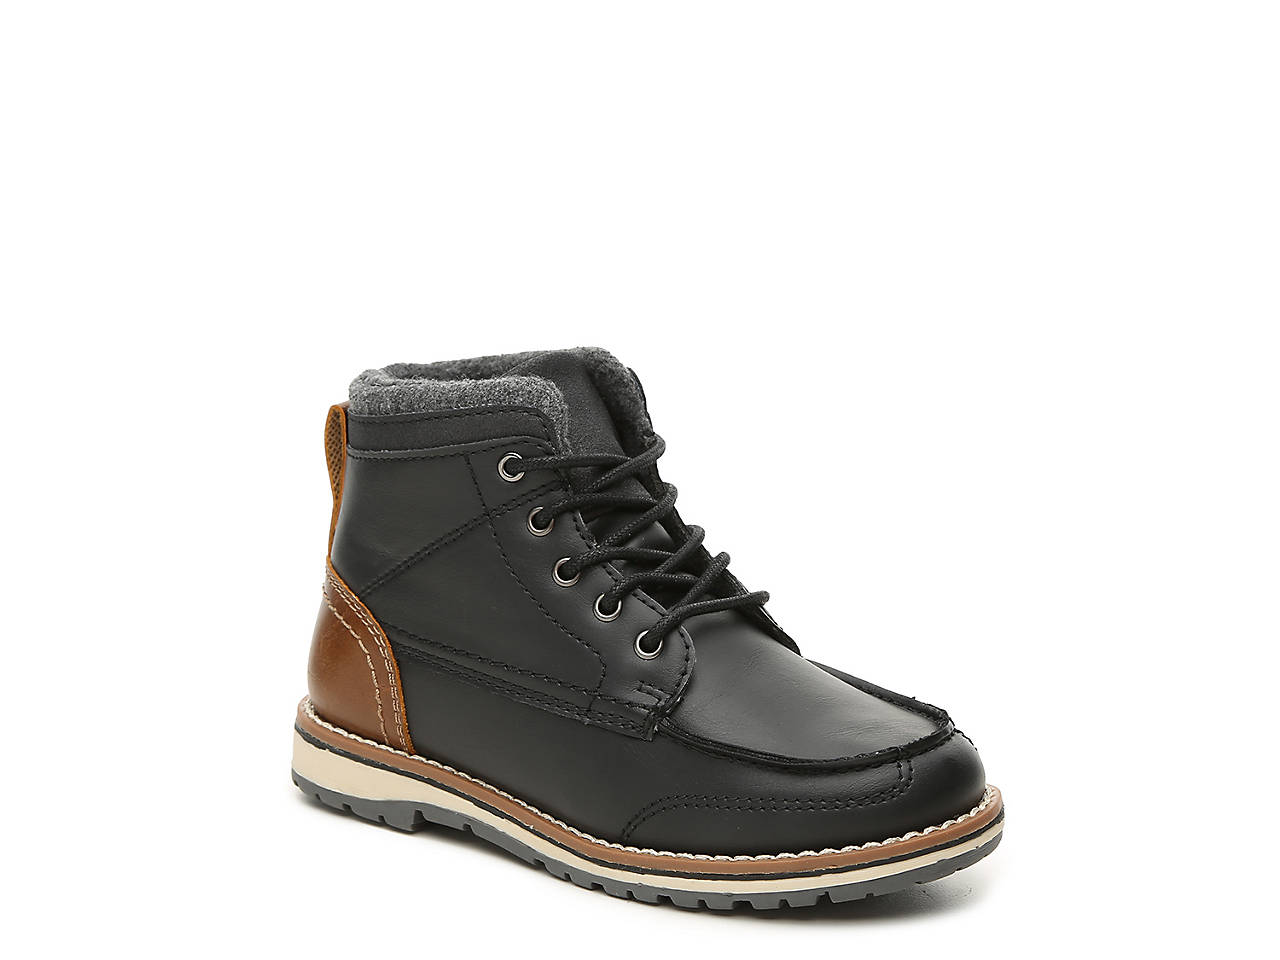 85b8b41c6ed Max + Jake Brody Youth Boot Kids Shoes